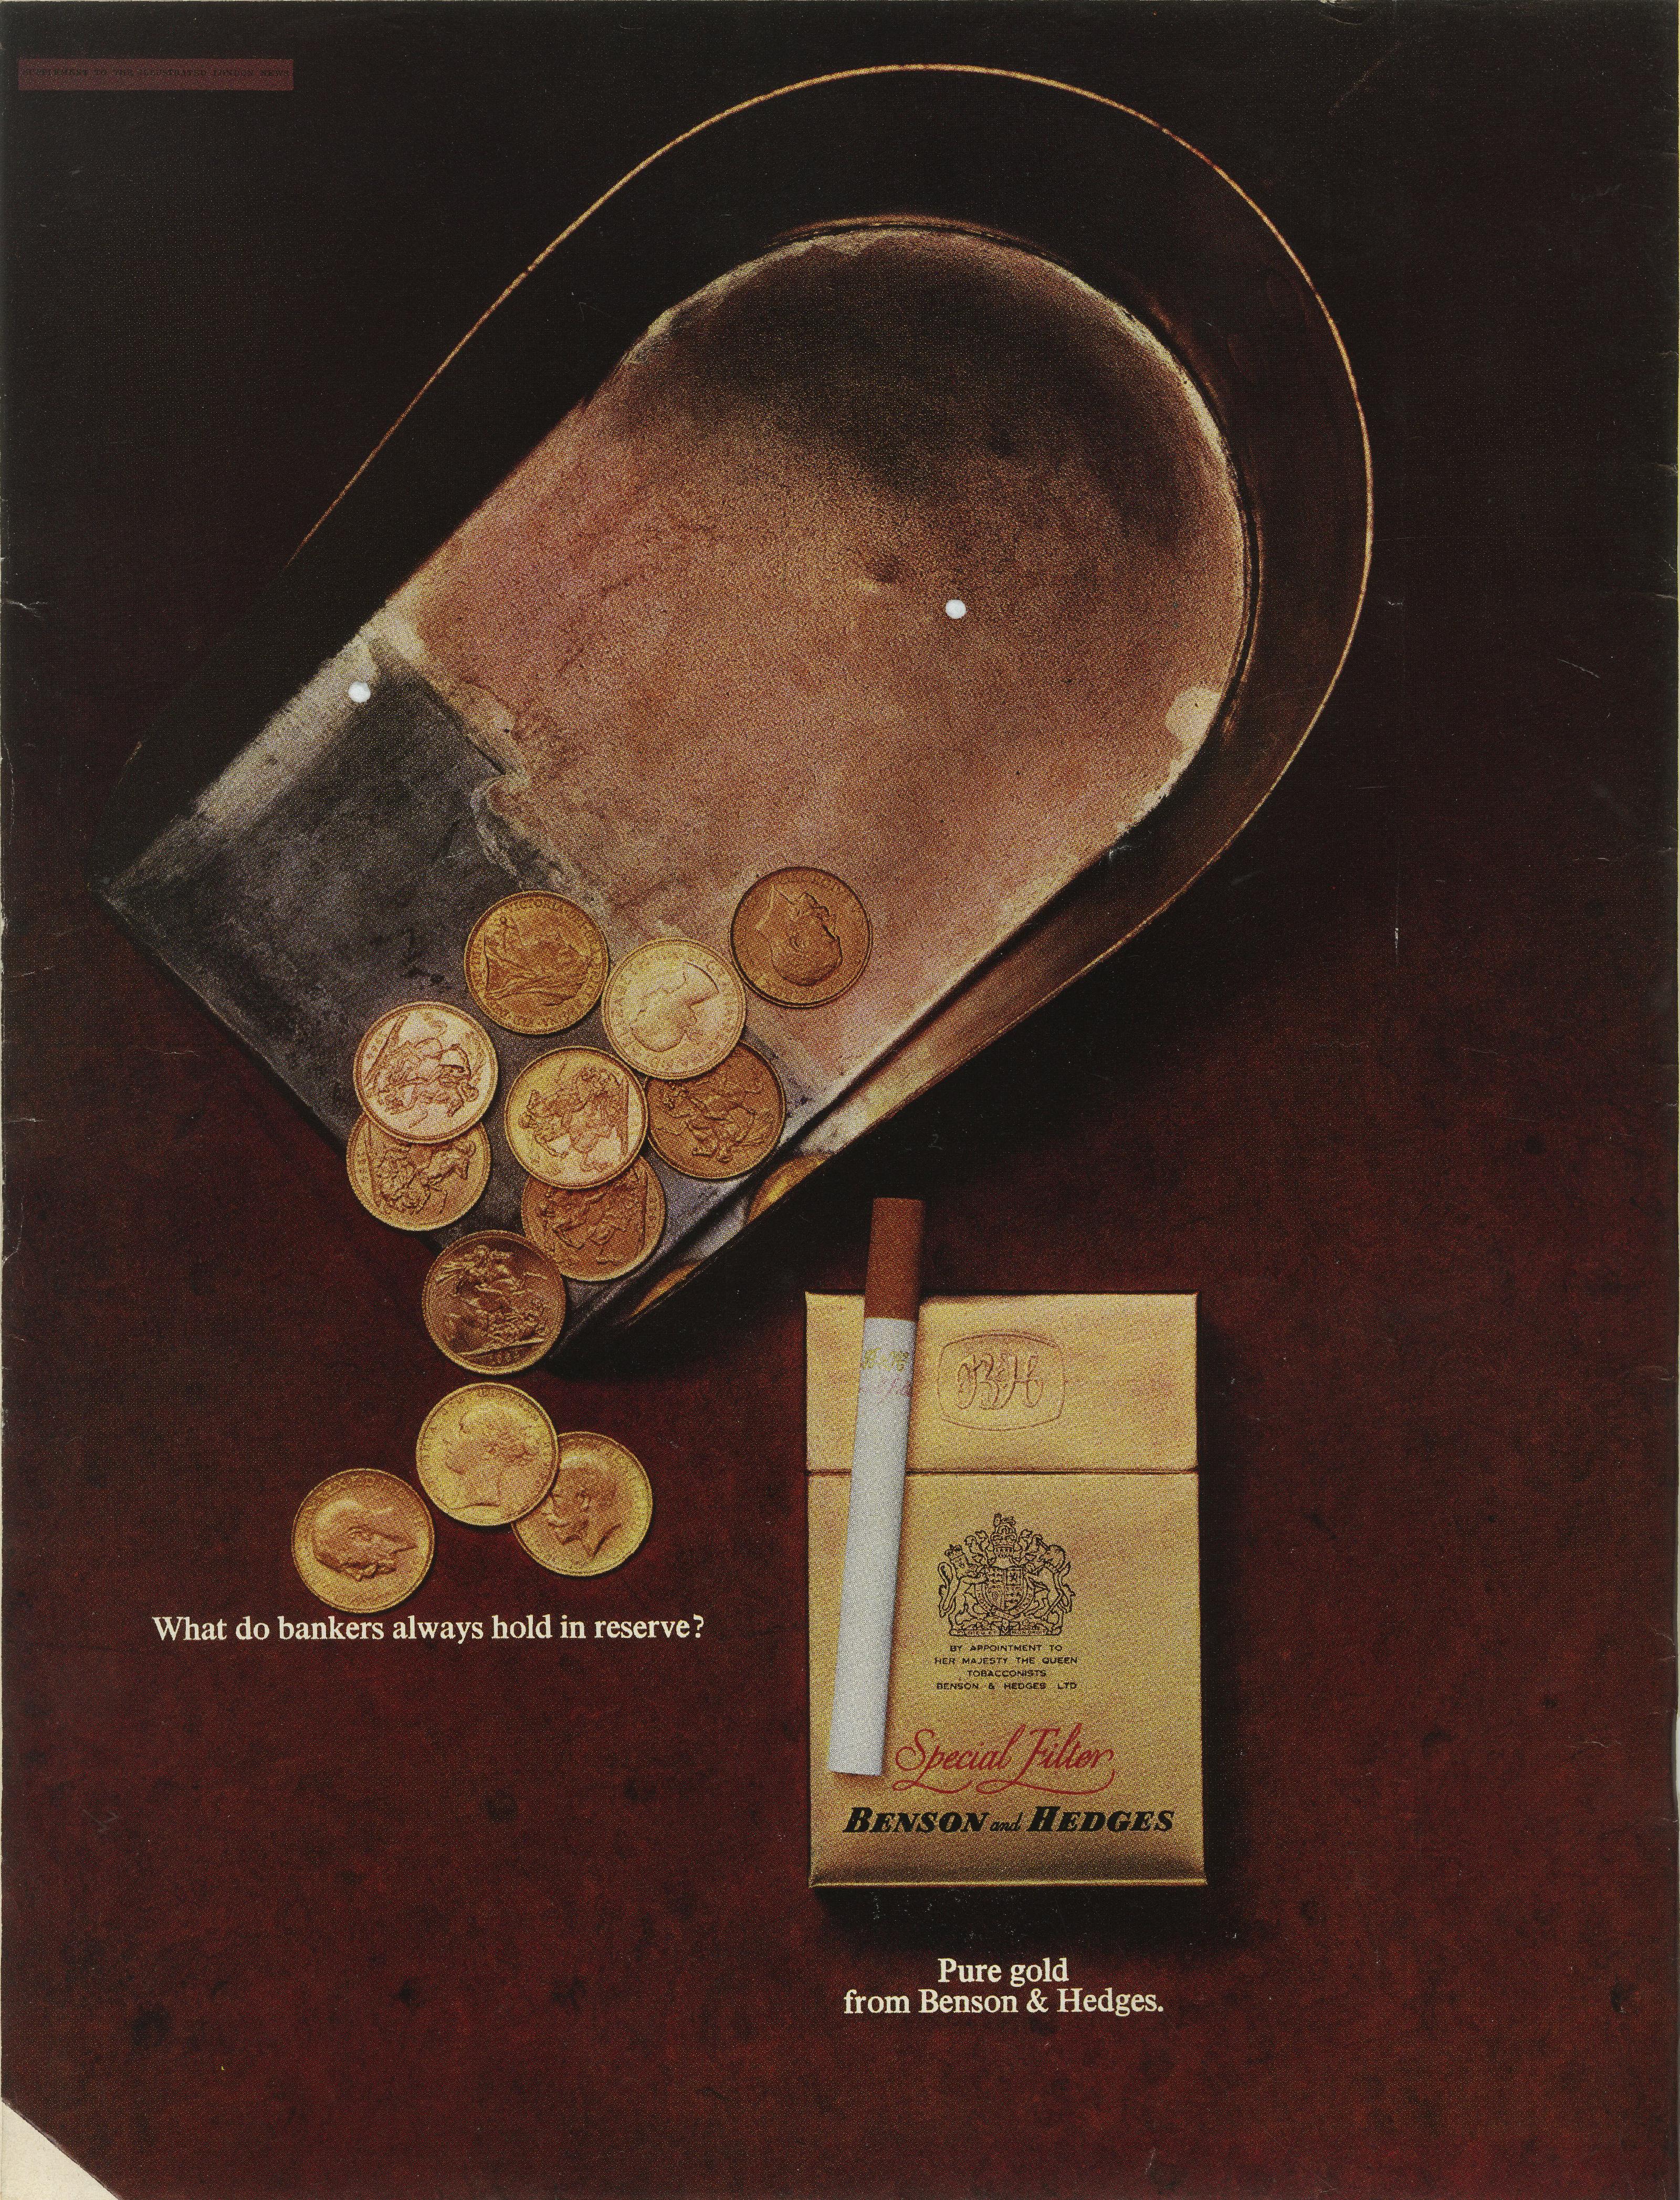 B&H Gold Box 'Gold Pennies' CDP-01